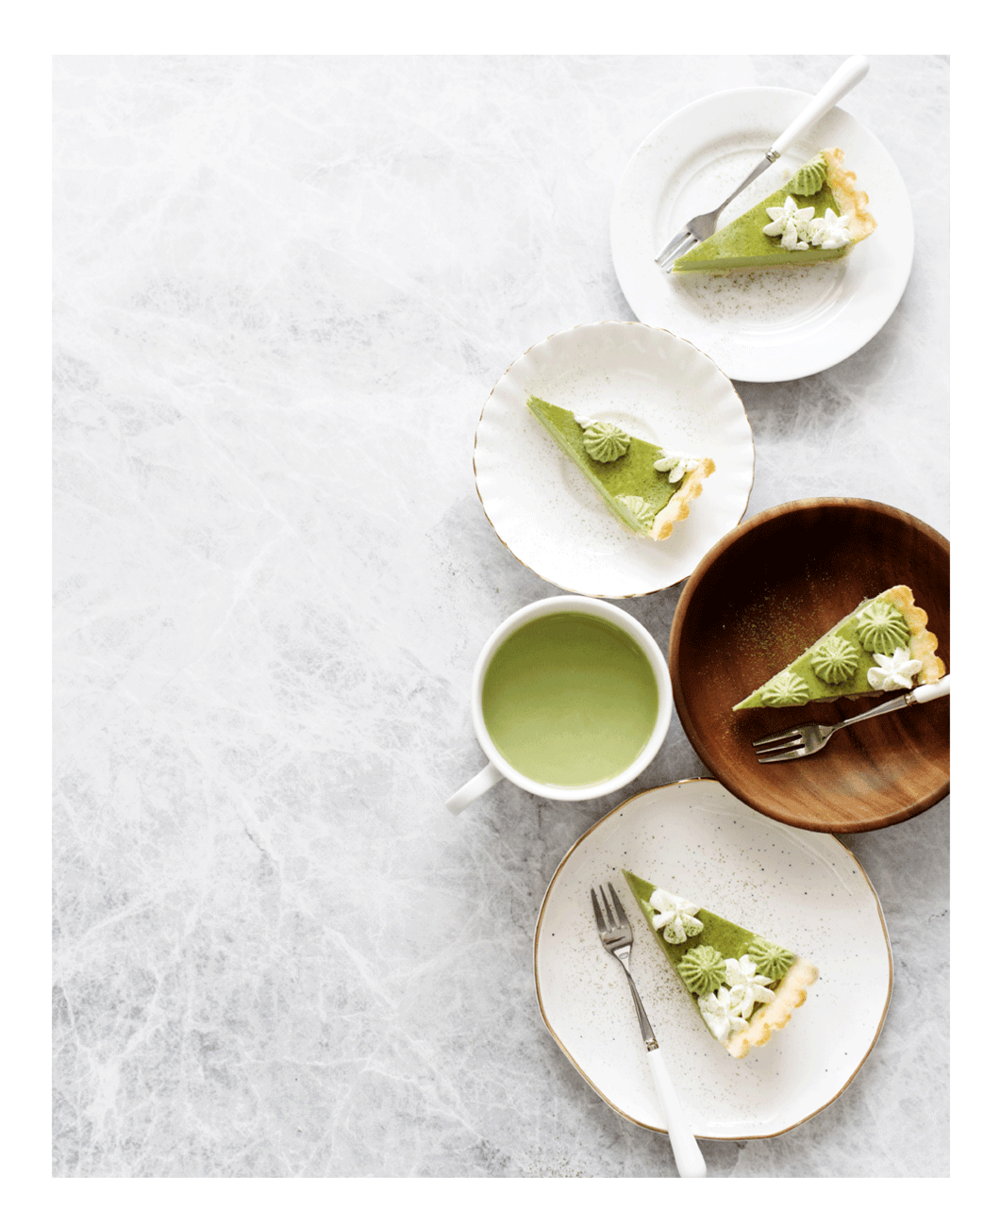 Matcha-cheese-tart-2 teak and thyme-.png